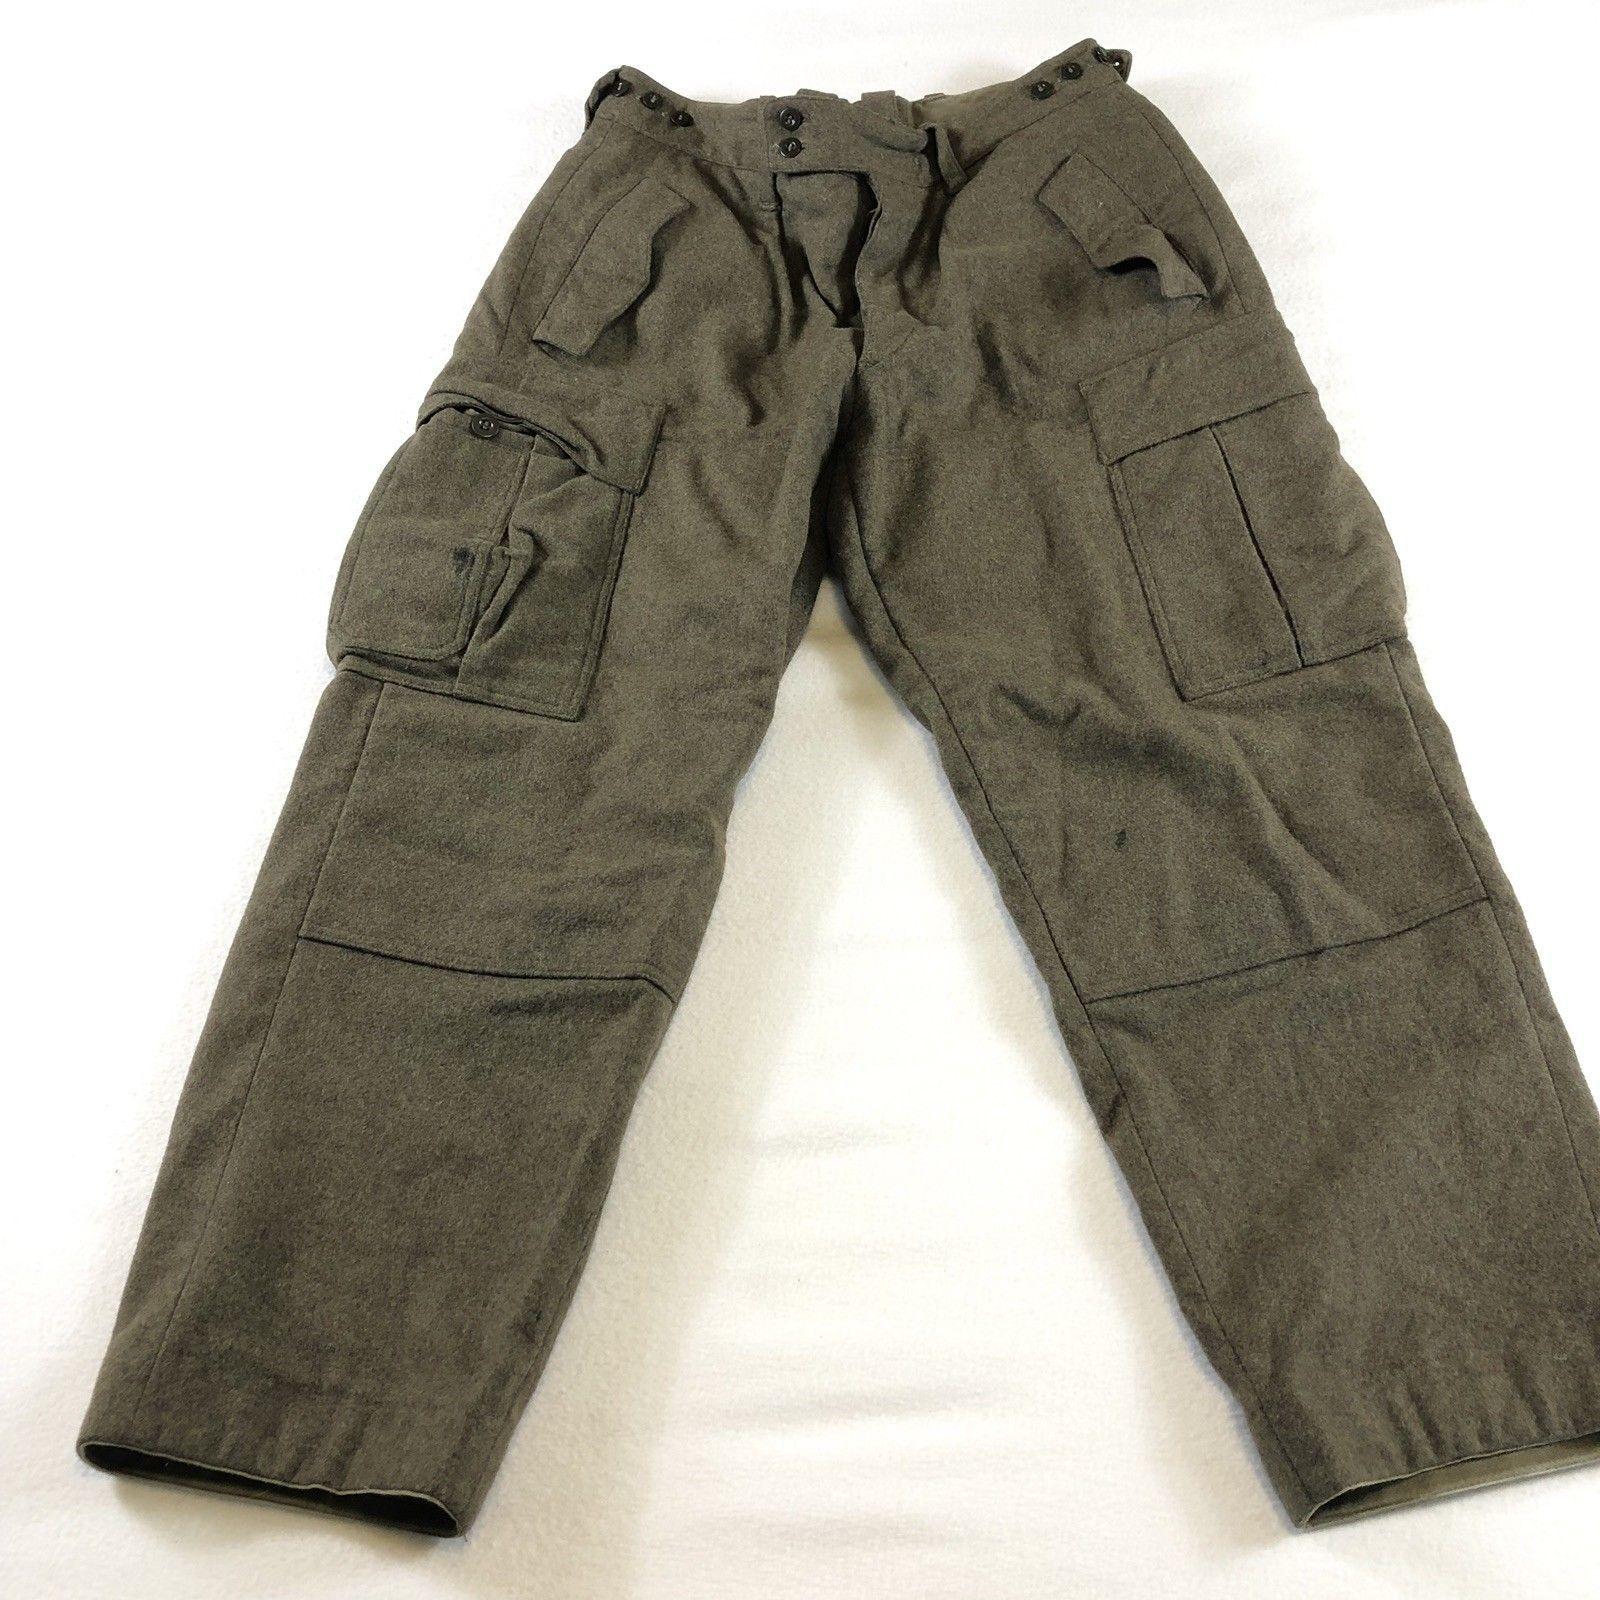 Original Vintage US GI Military M65 Field Trousers